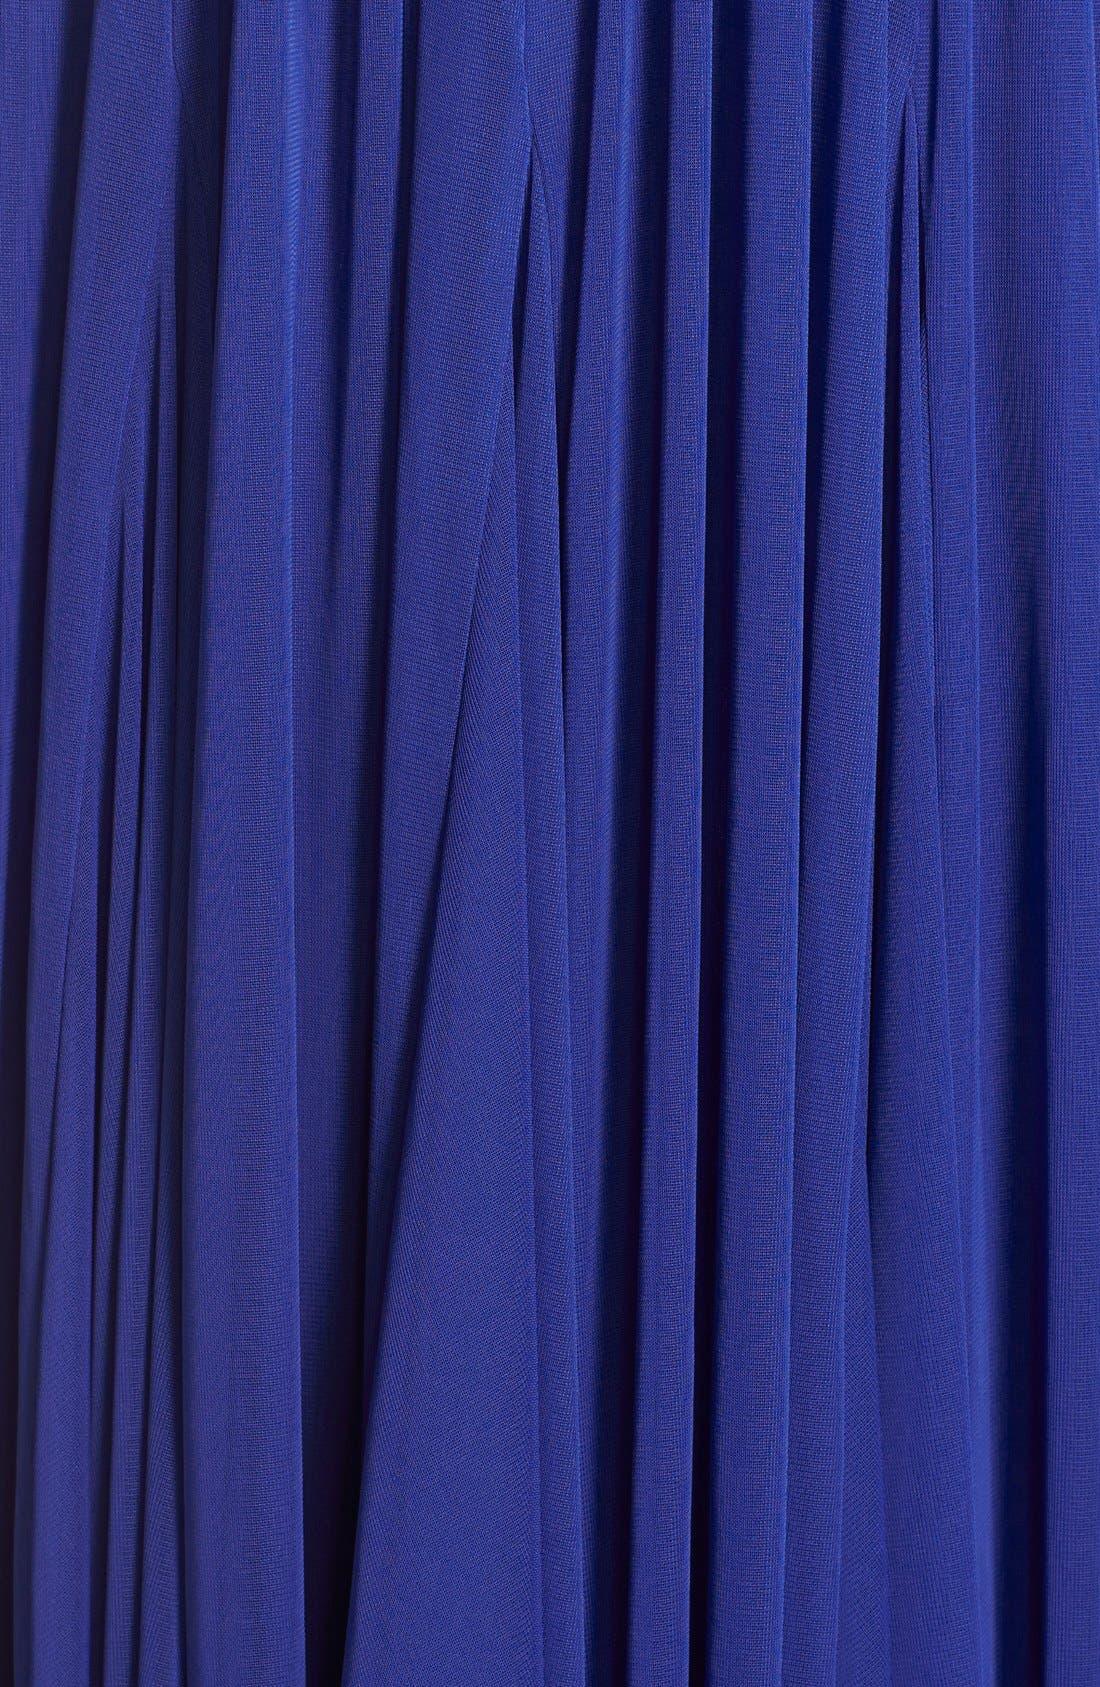 Embellished Tulle Halter Gown,                             Alternate thumbnail 3, color,                             437